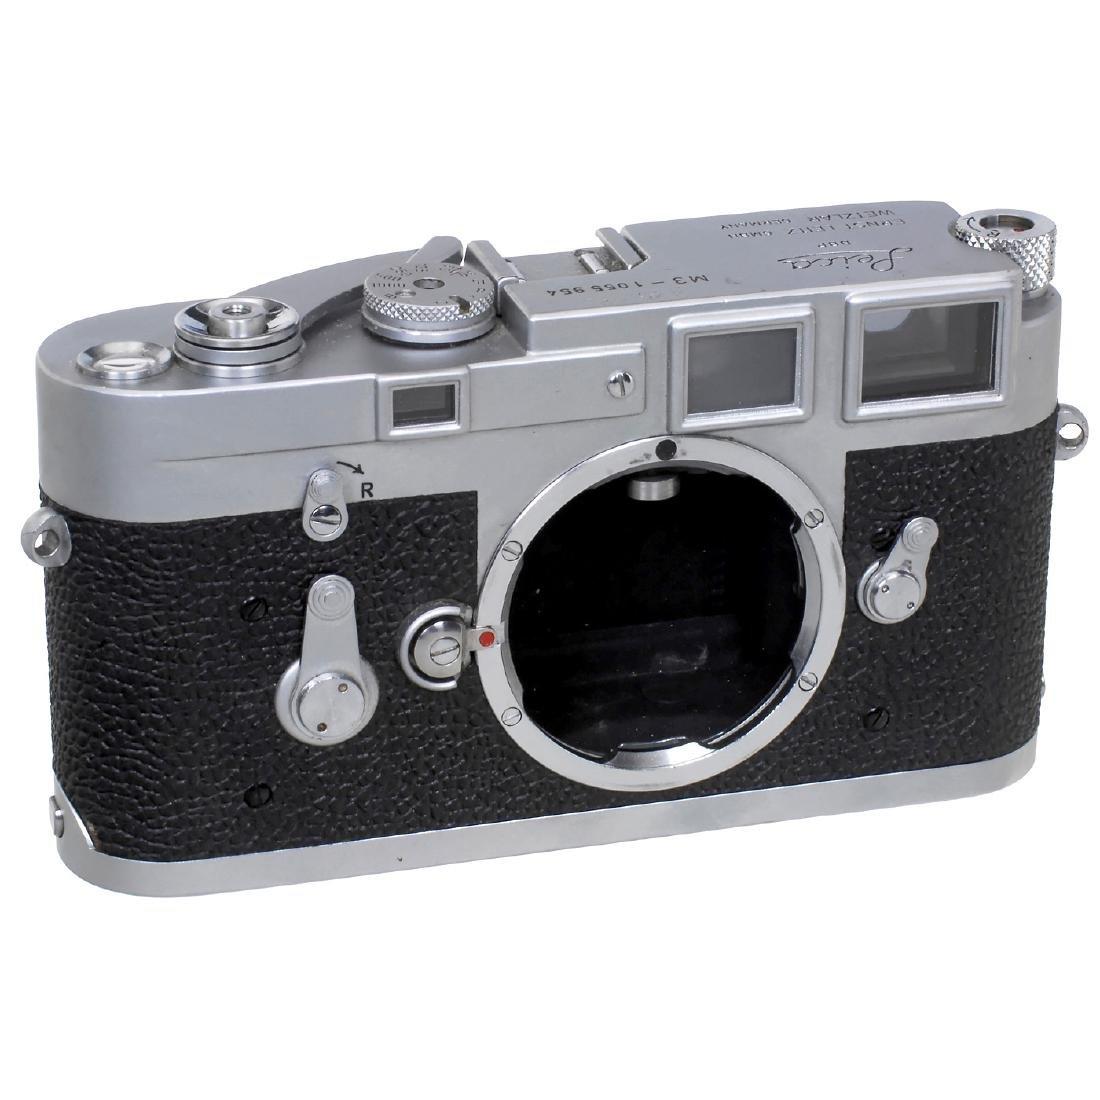 Leica M3 Body, 1962